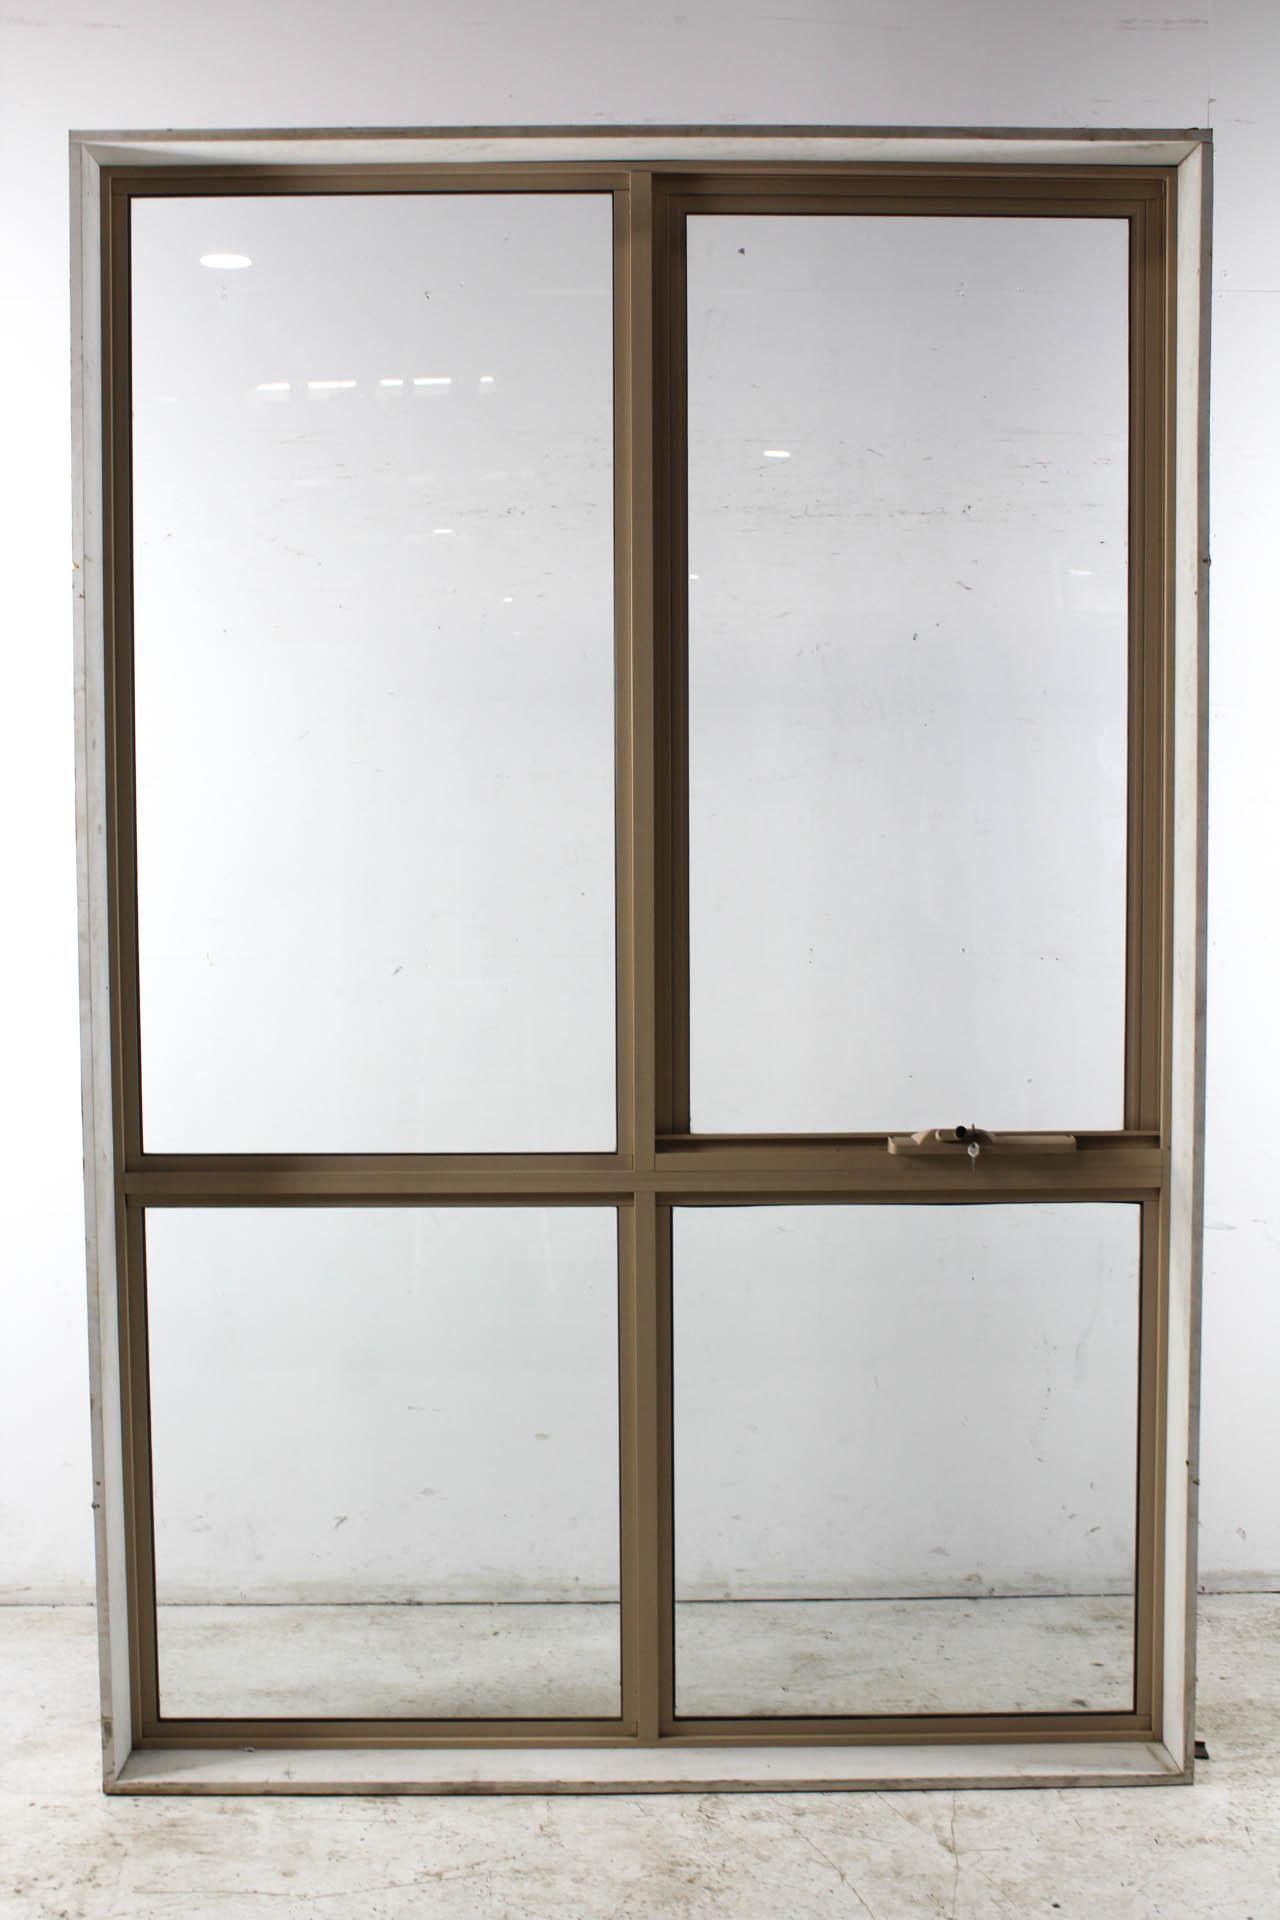 Alloy Awning Window - Renovators Paradise